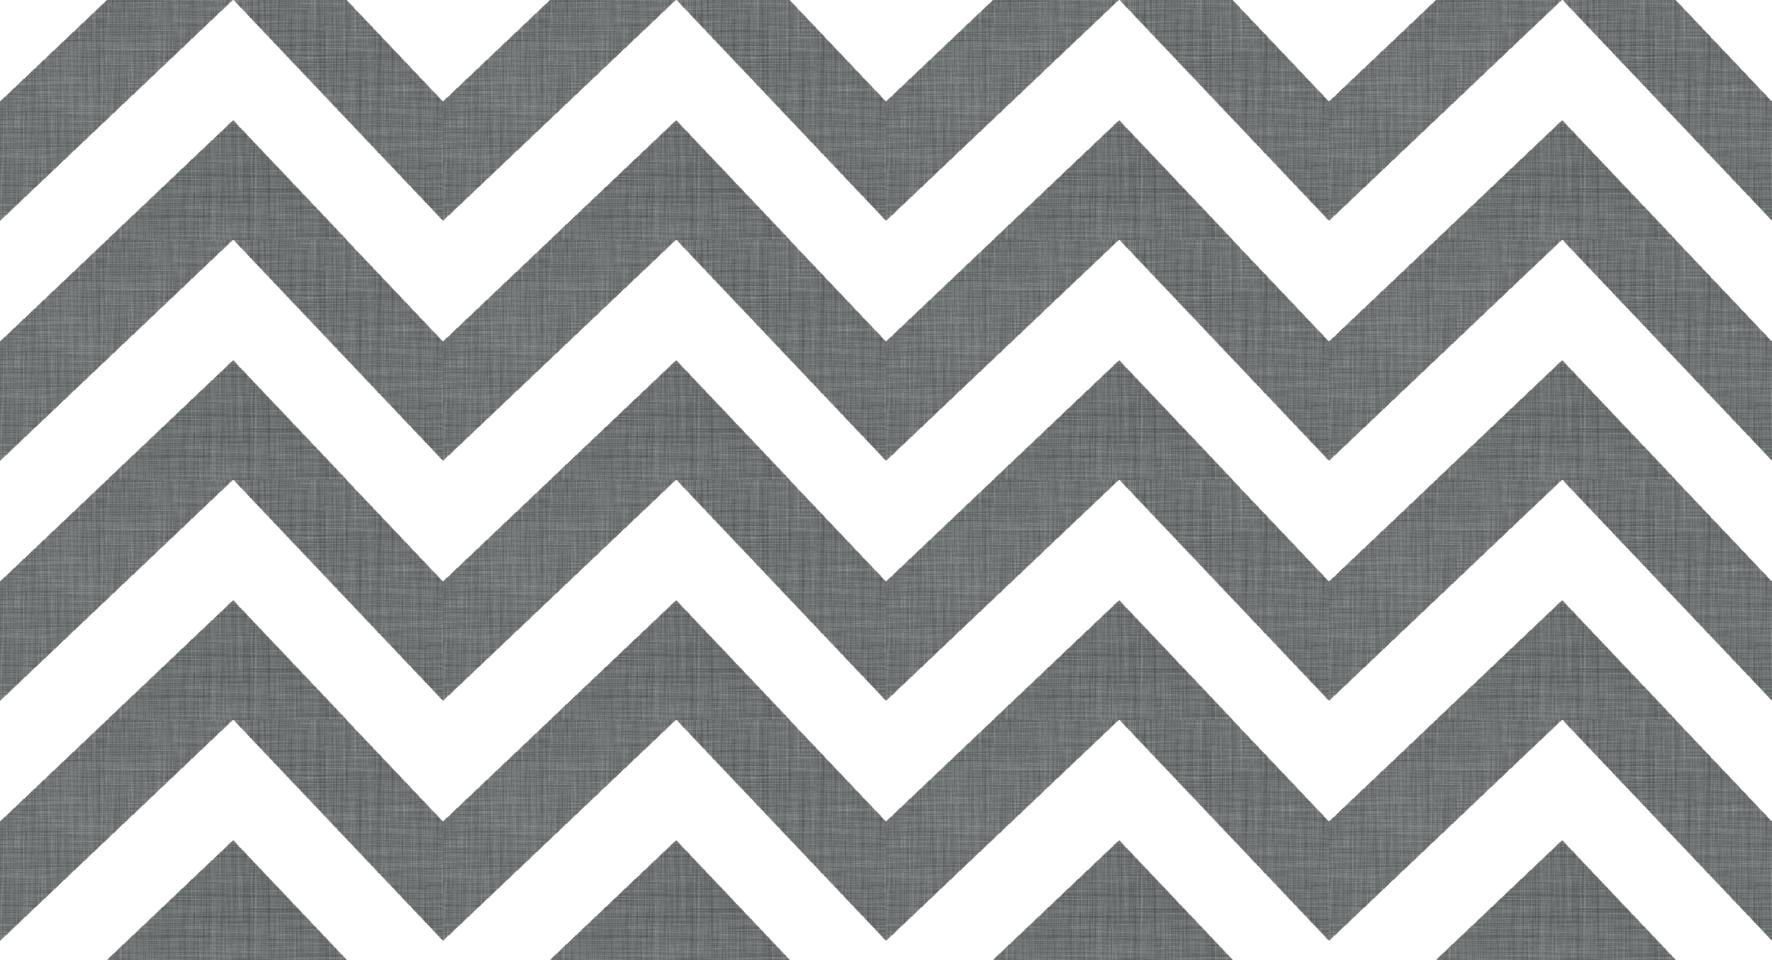 Grey Chevron Wallpaper - WallpaperSafari